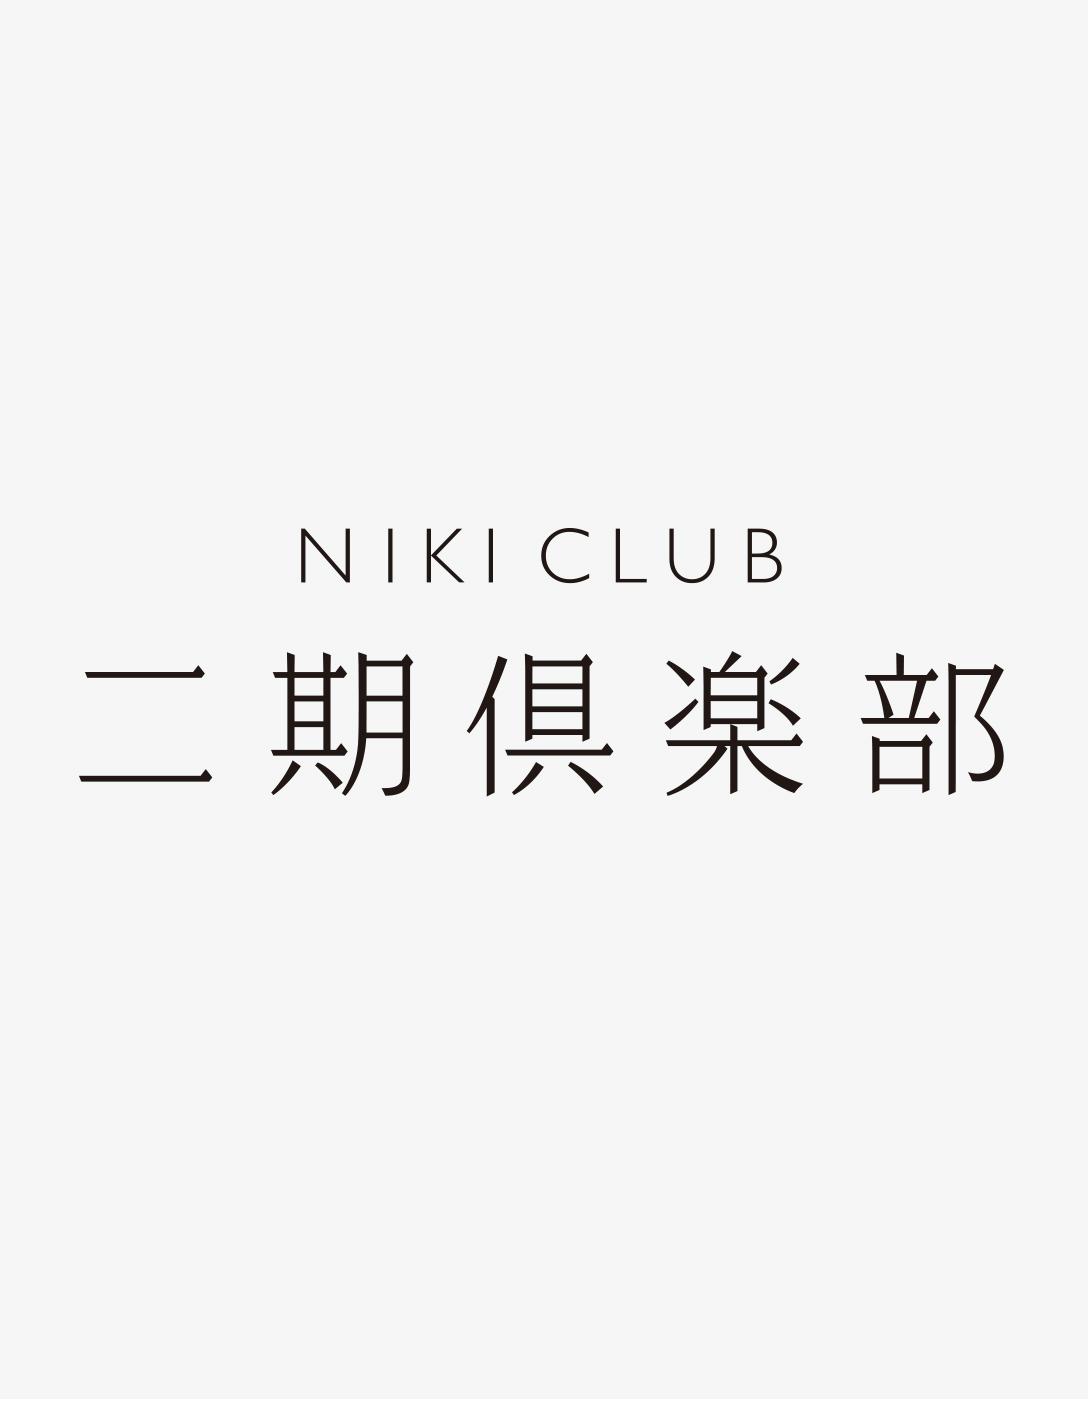 NIKI CLUB